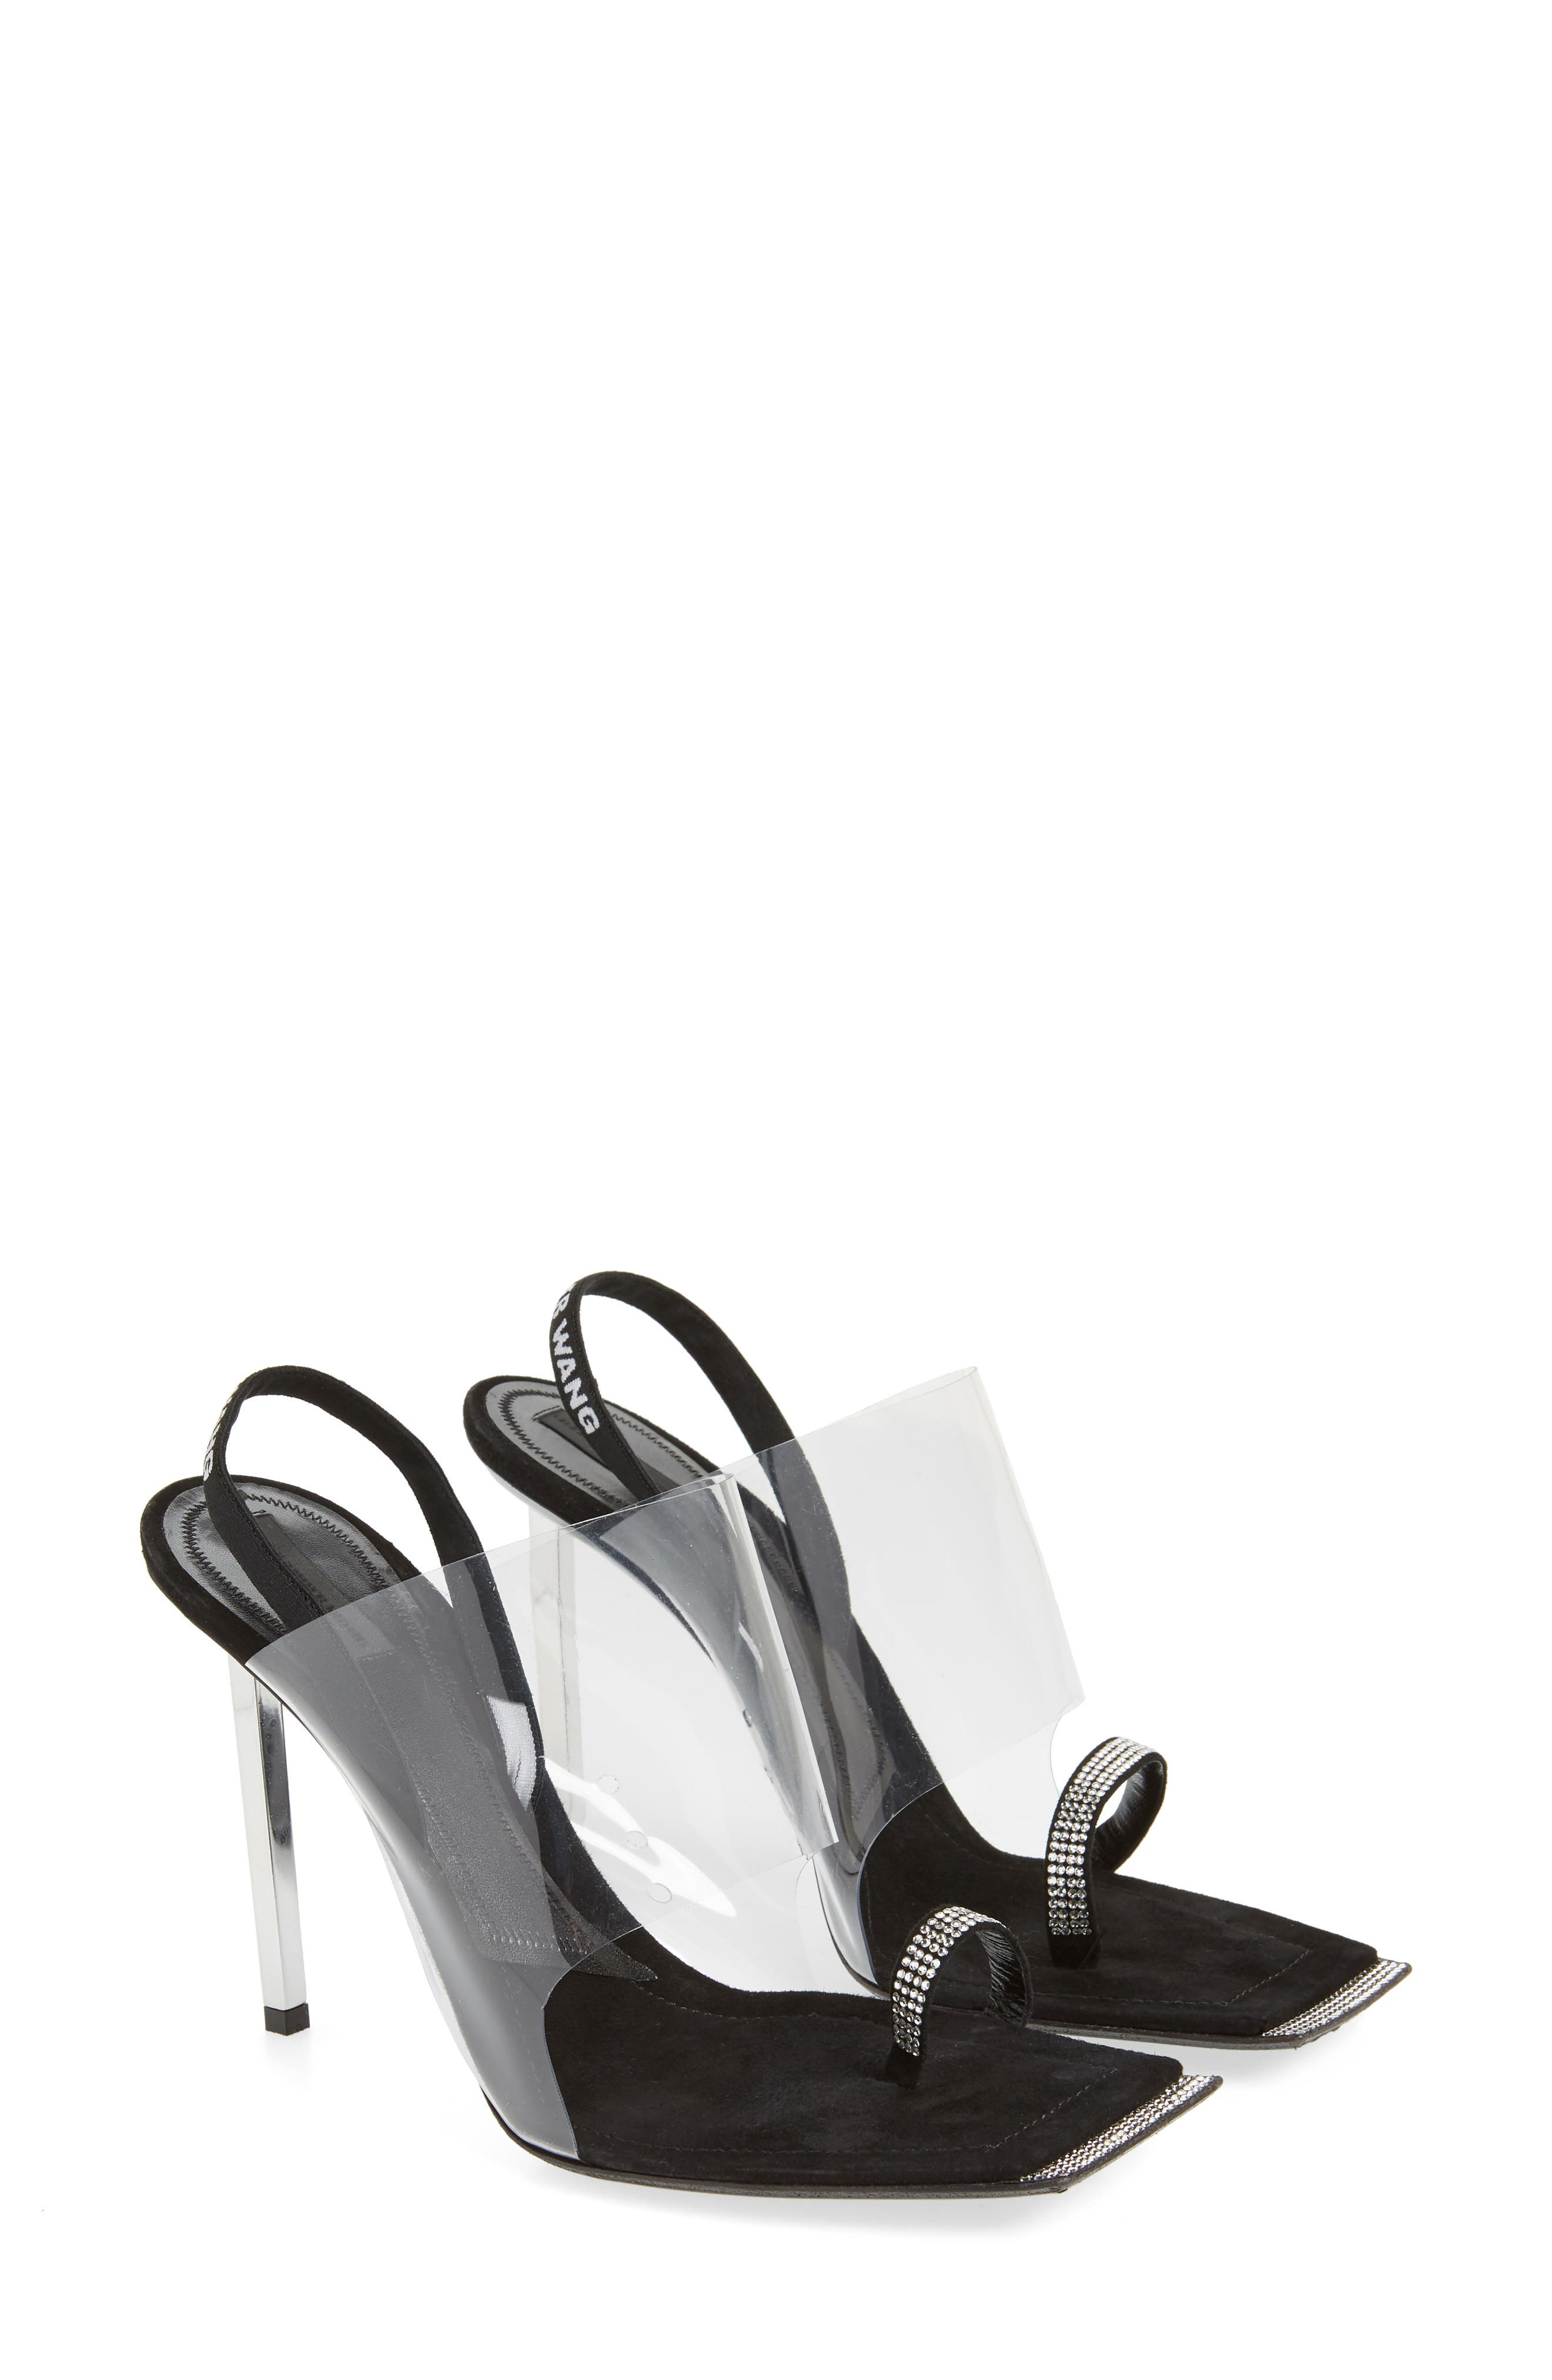 ALEXANDER WANG, Clear Shield Sandal, Alternate thumbnail 2, color, BLACK